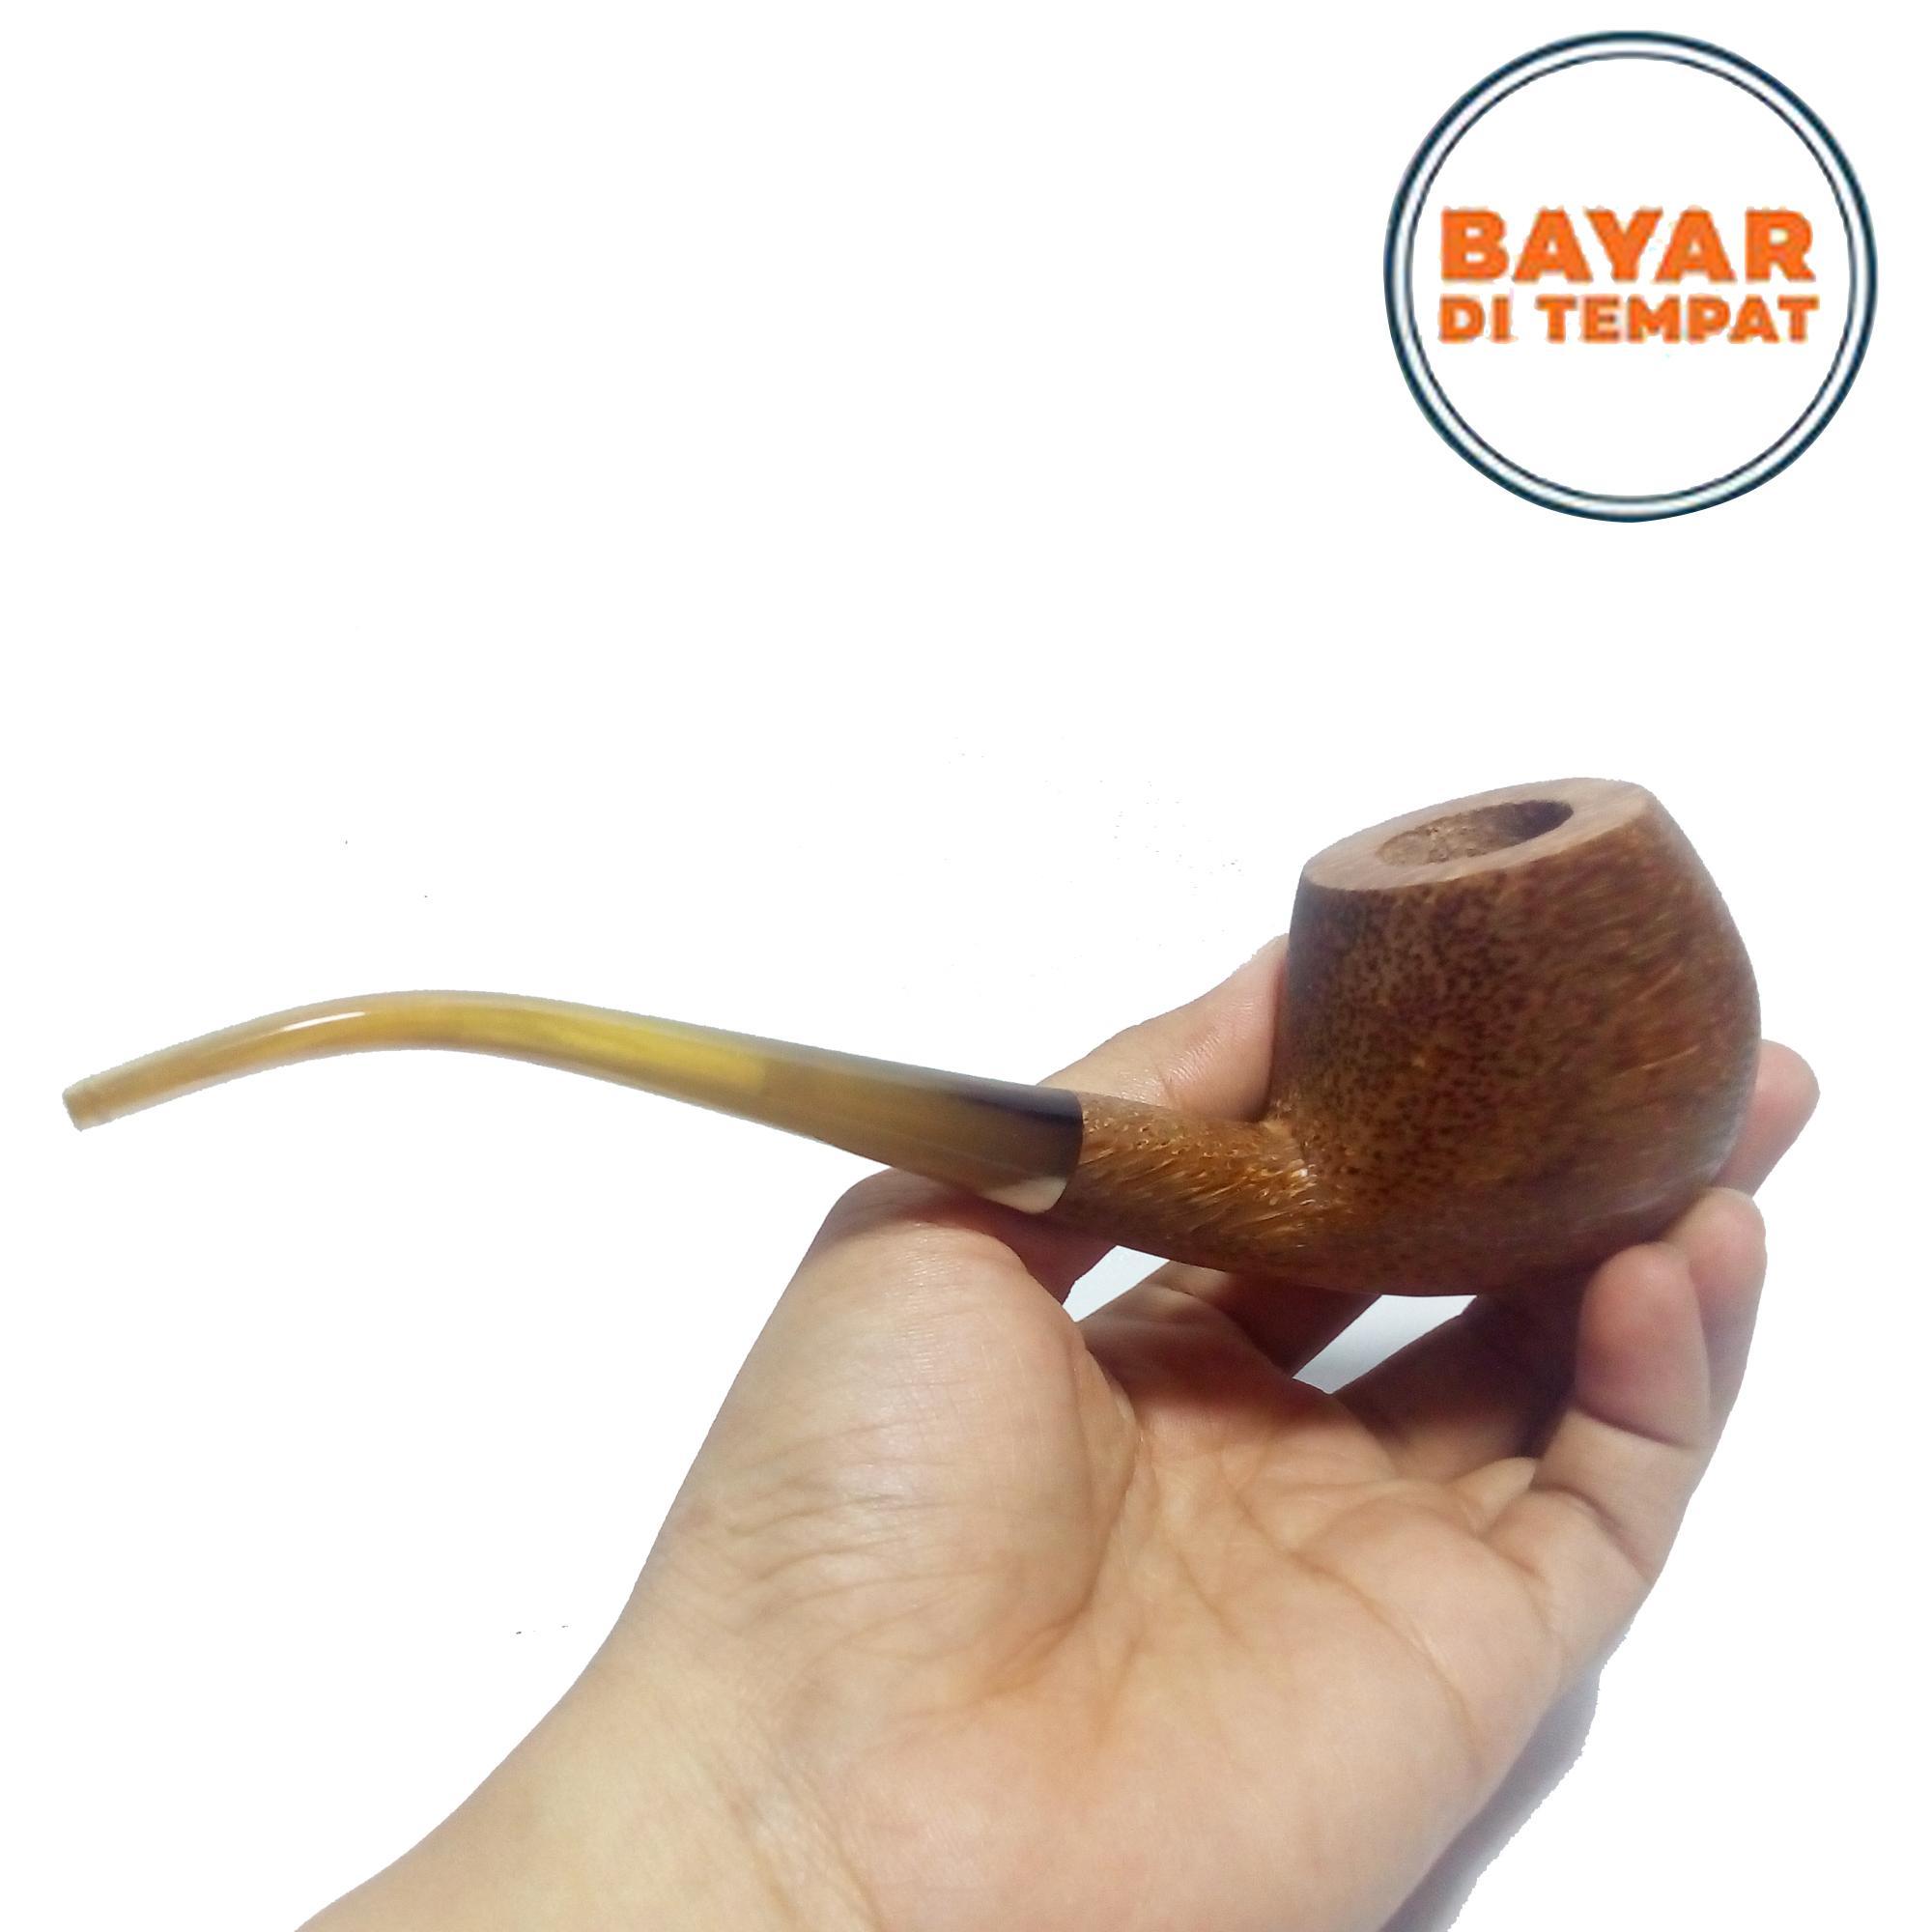 Pipa Rokok Cangklong Haojue Pres Daftar Harga Terbaru Dan Penyaring Racun Nzh 129 Filter Smoke Clean Cool Djogja Market Tembakau Tanduk Kayu